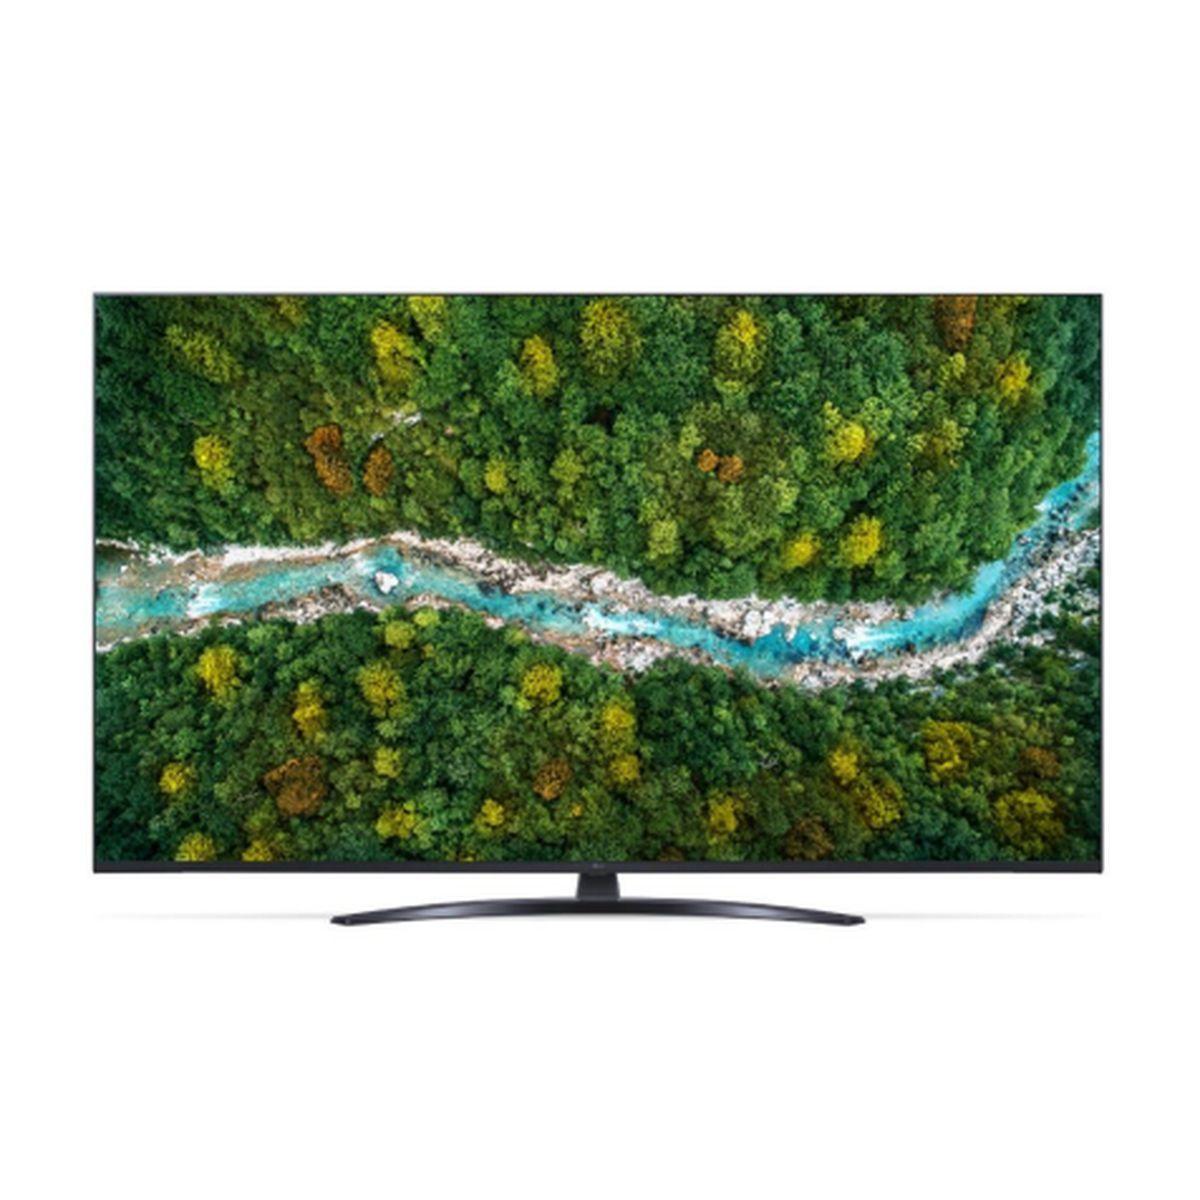 50UP7800 TV LED 4K UHD 126 cm Smart TV